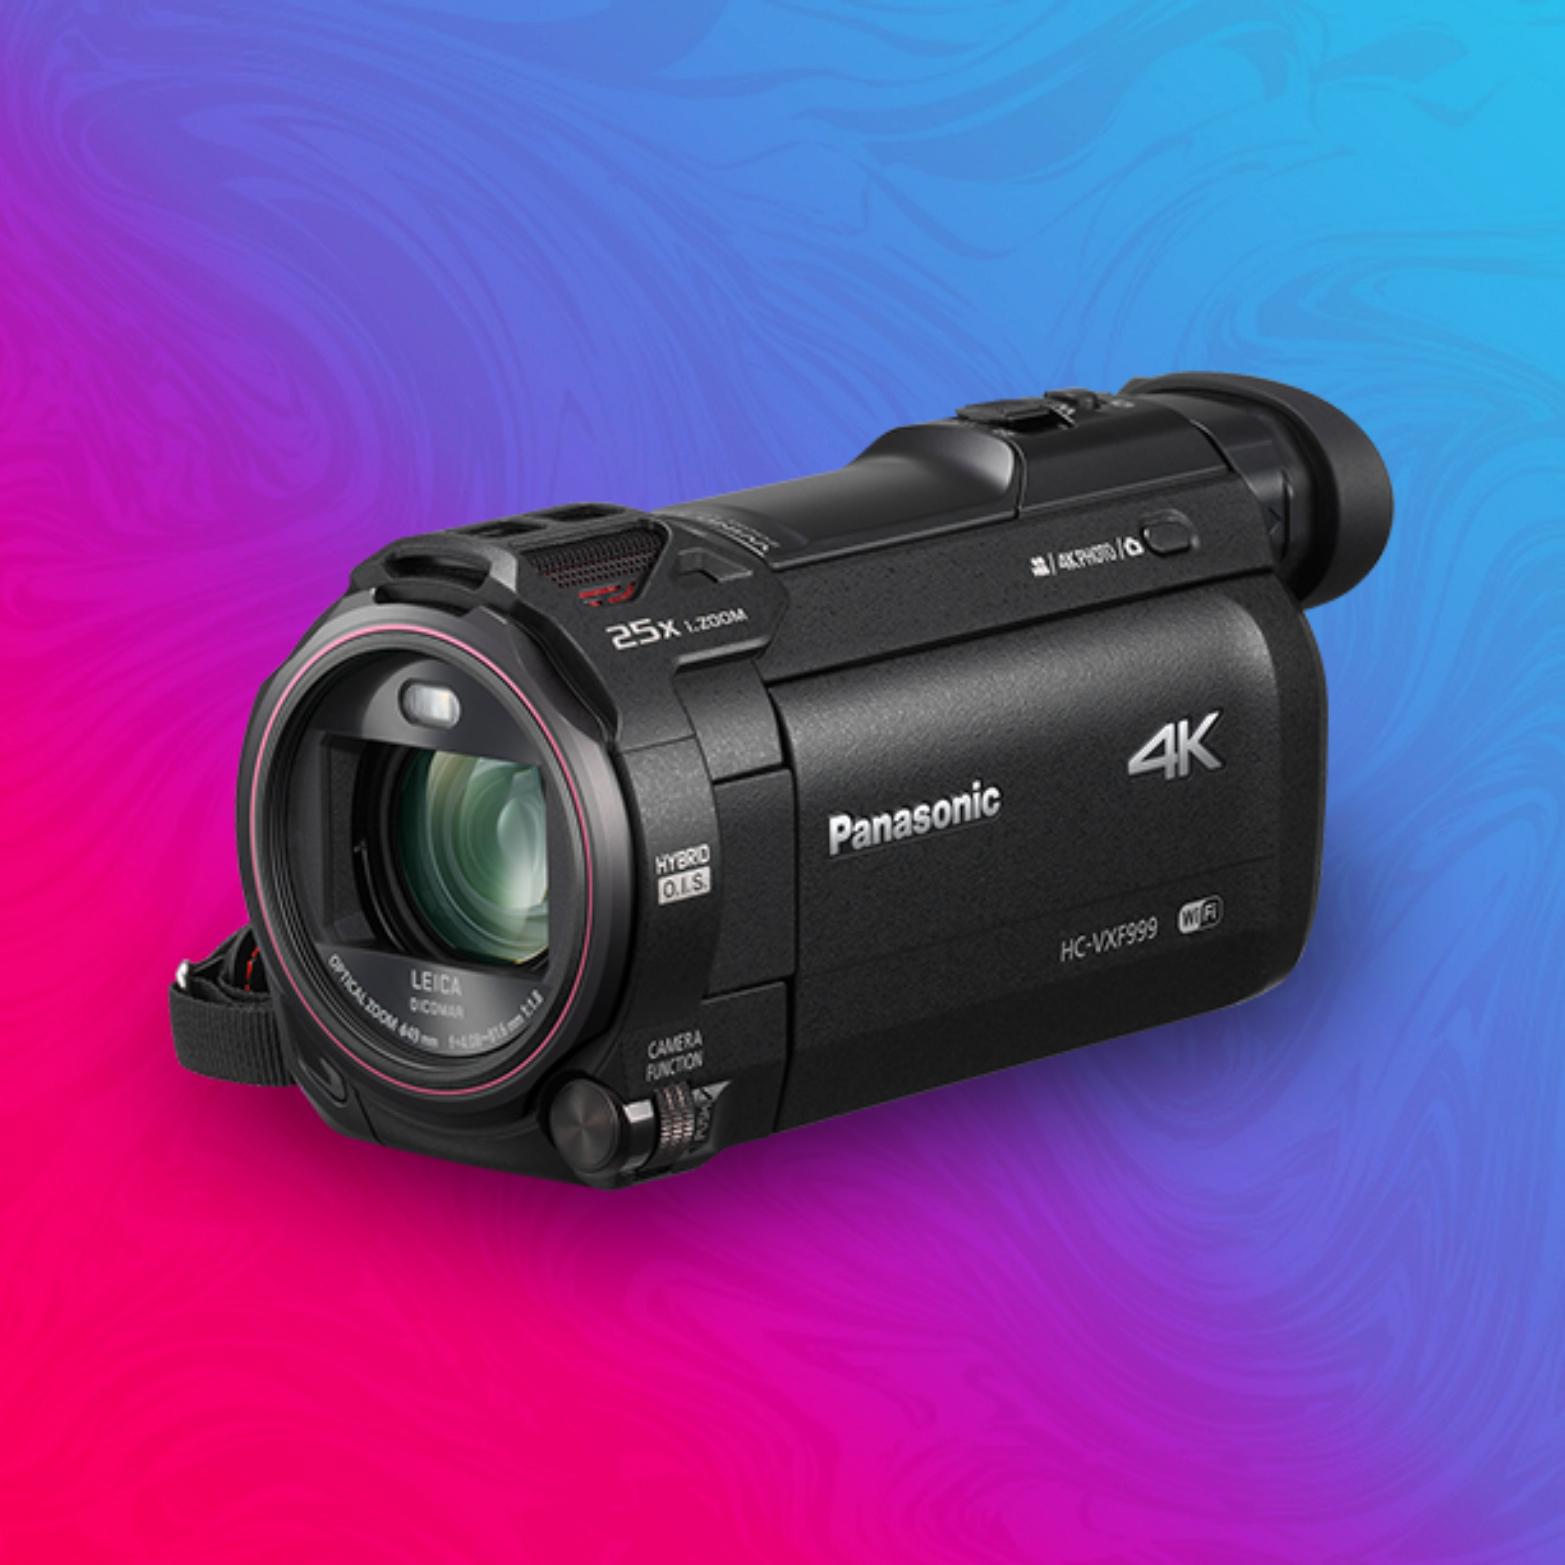 Panasonic HC-VXF999: 4K-Camcorder mit WiFi (Leica Dicomar Objektiv, 20x optischer Zoom, 4K Video)